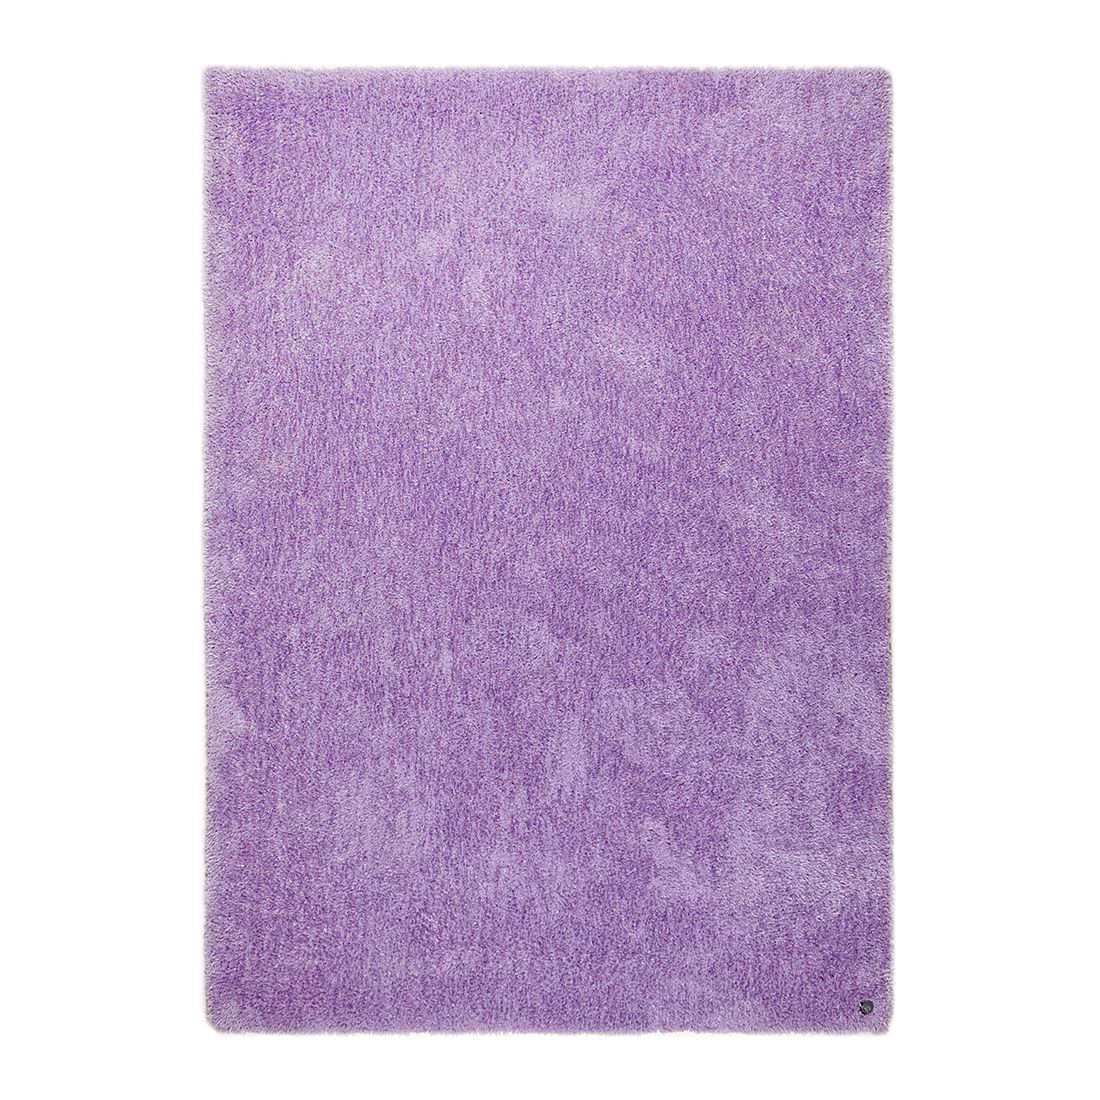 Teppich Soft Square - Hell Violett - Maße: 190 x 290 cm, Tom Tailor